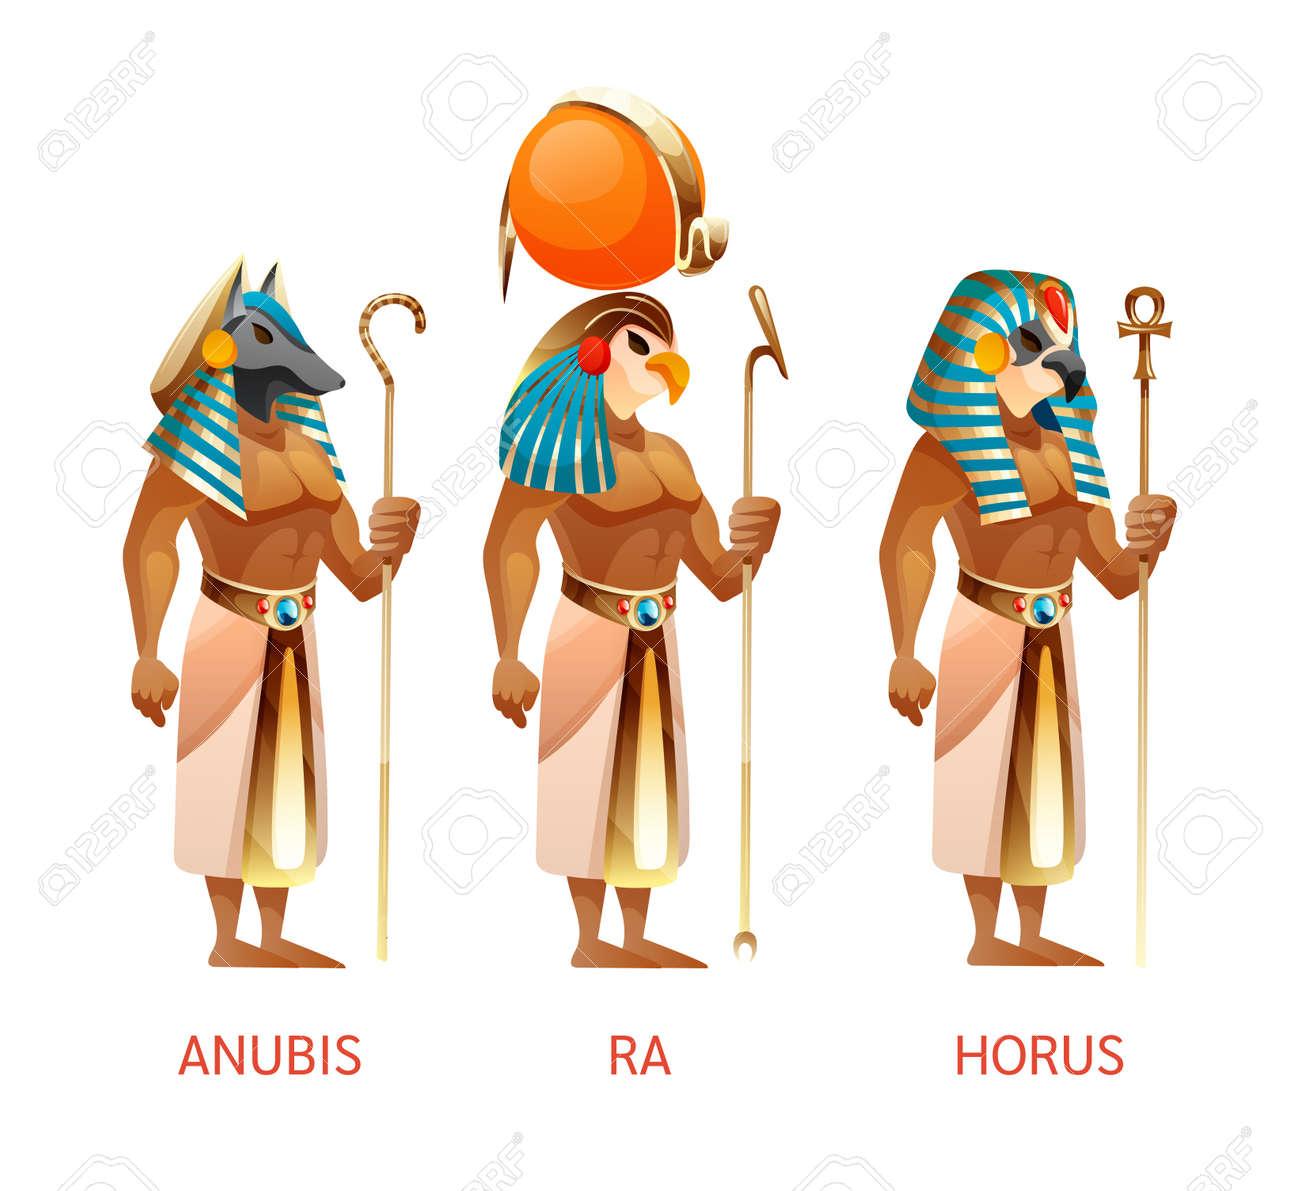 Ancient Egyptian Gods Ra Horus Anubis From Egyptian Mythology Royalty Free Cliparts Vectors And Stock Illustration Image 134400461